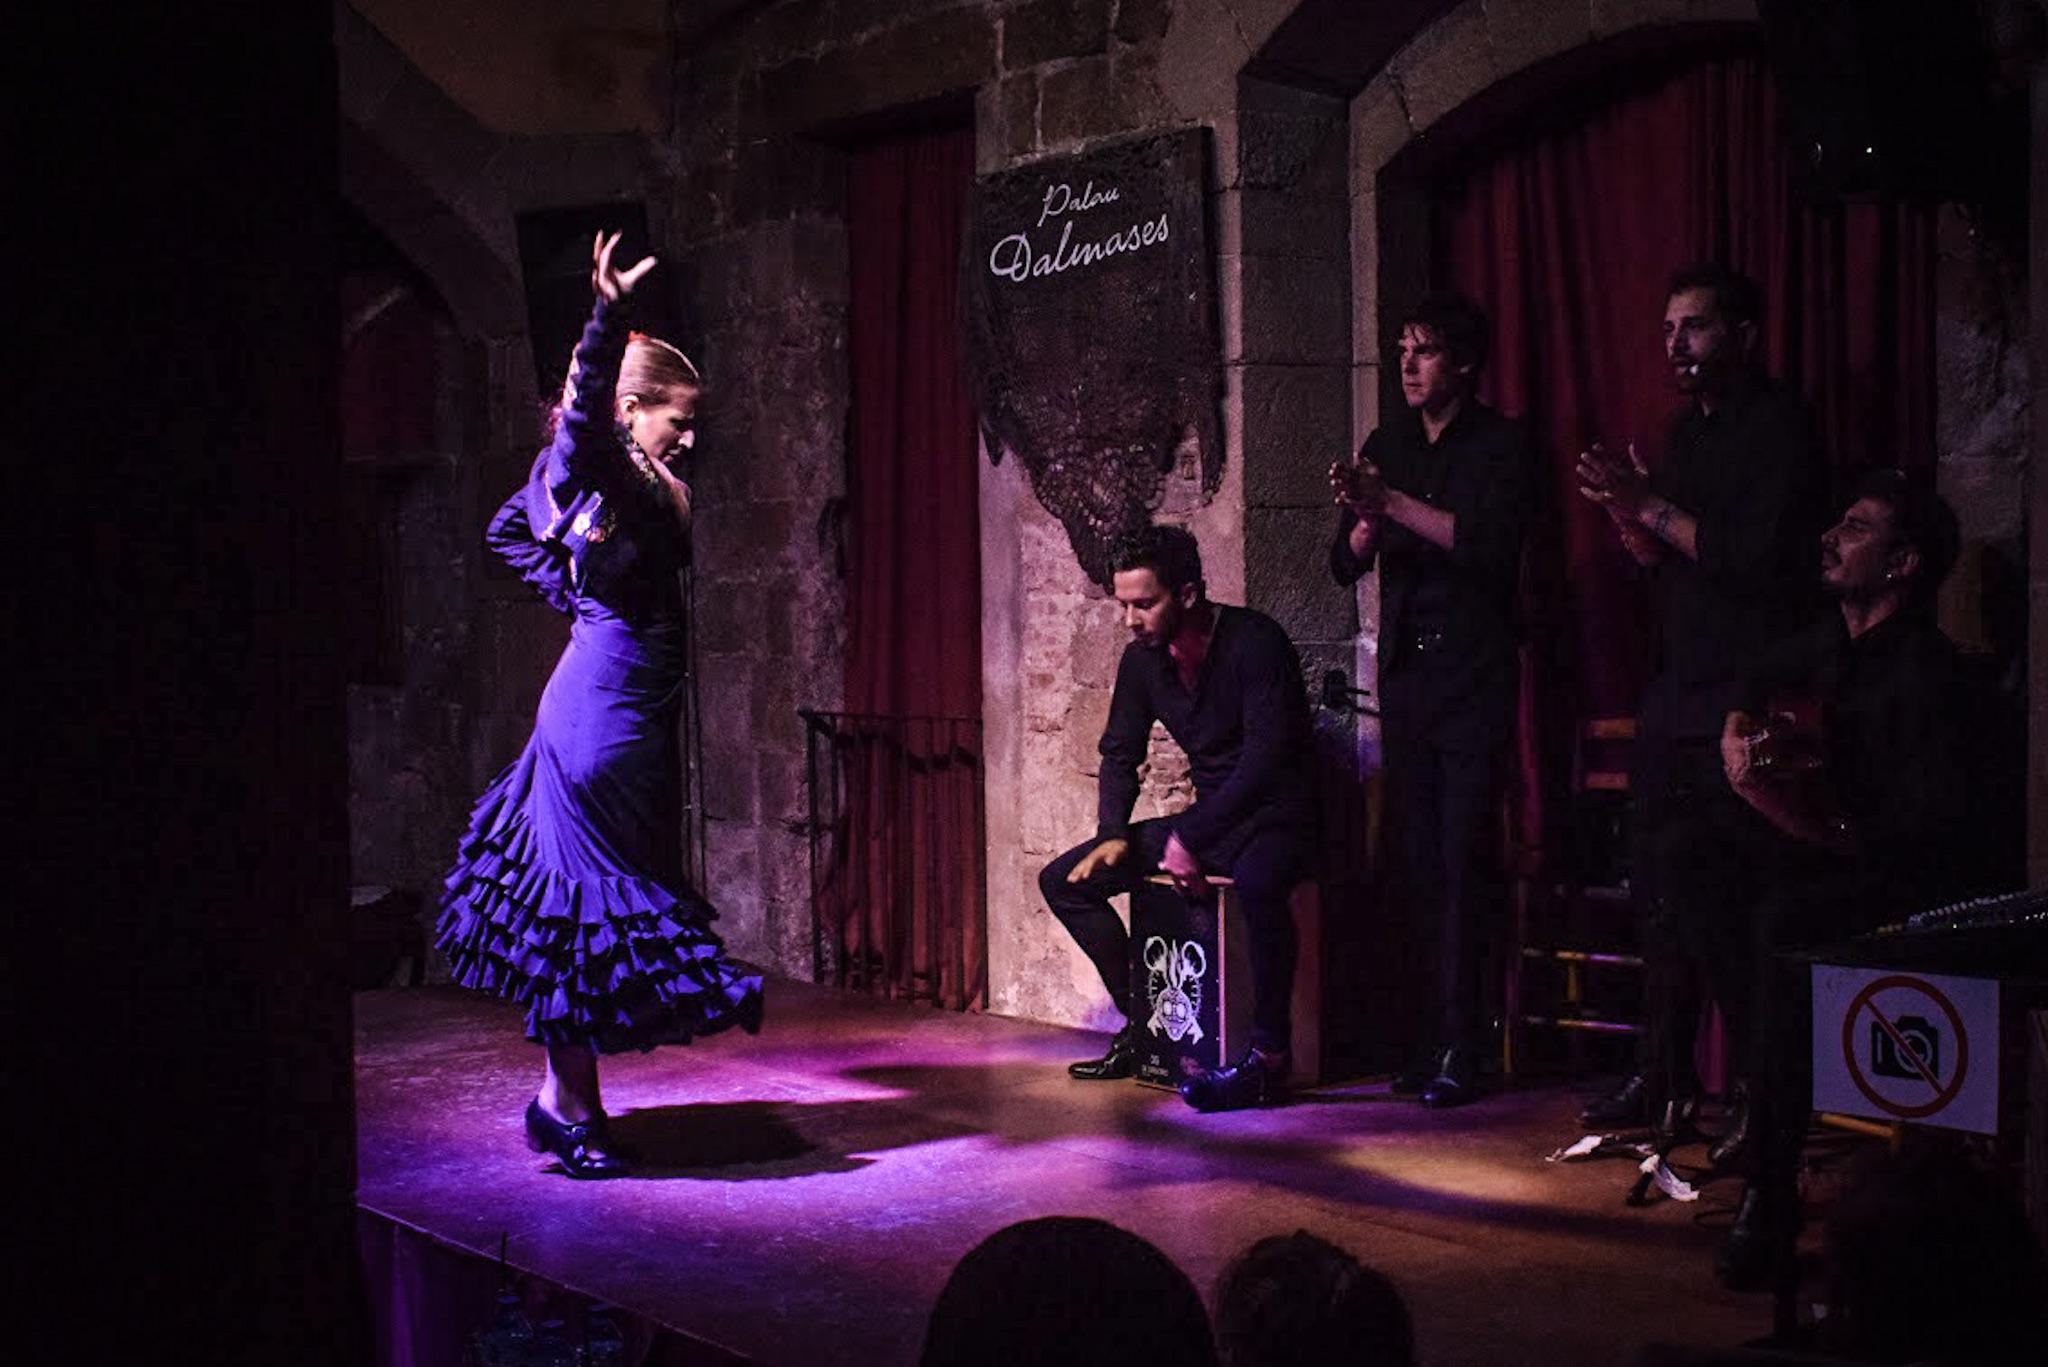 Palau Dalmases Flamenco Show Barcelona - by Ben Holbrook